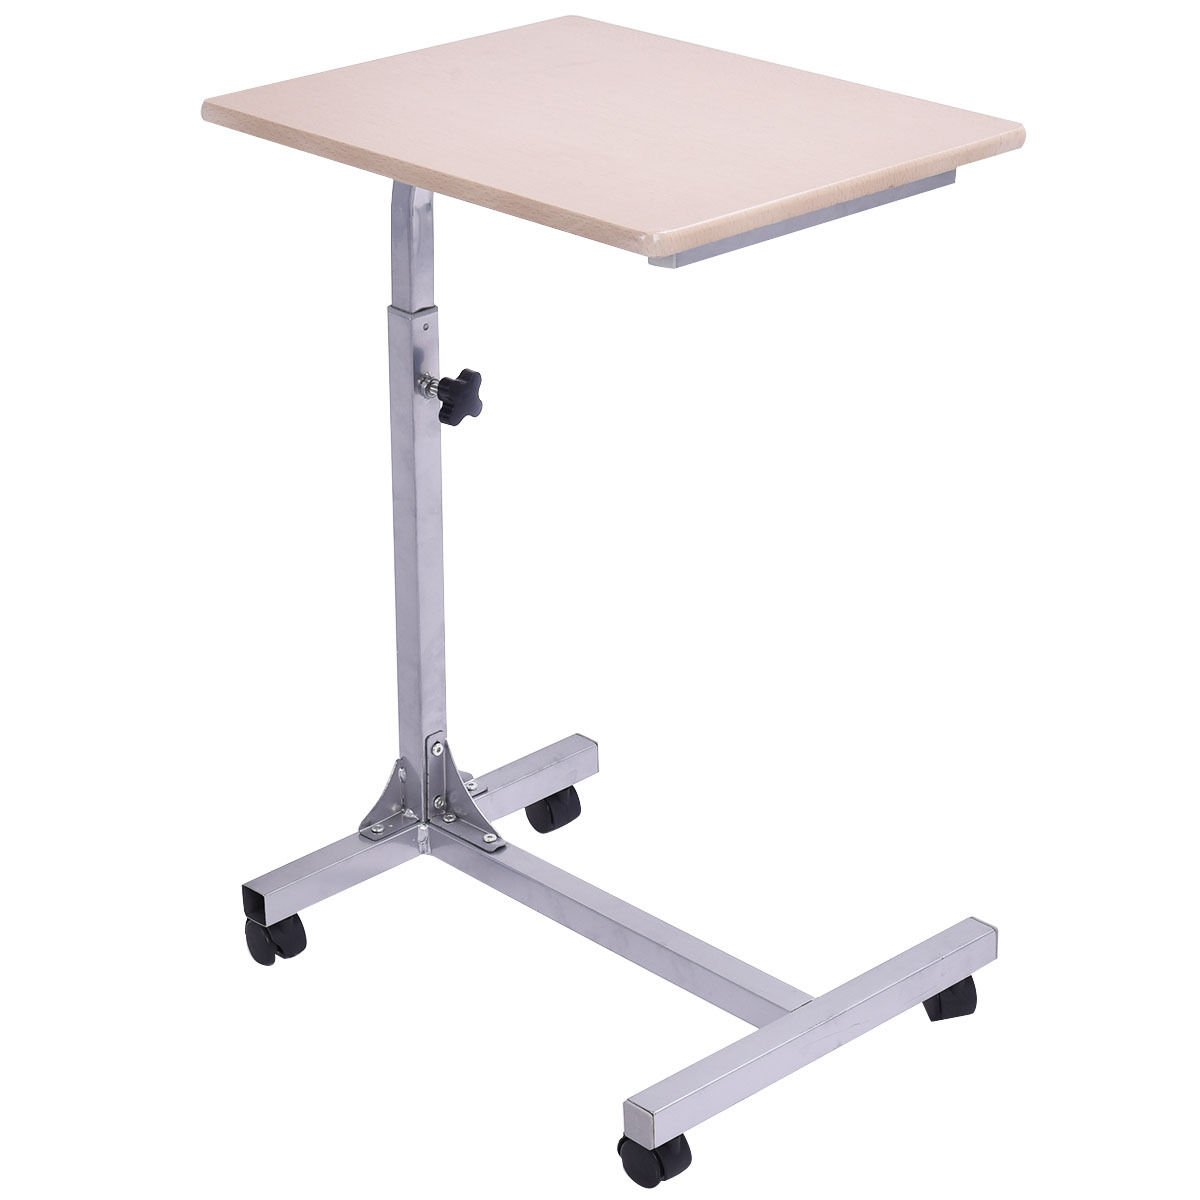 Tangkula Laptop Desk Overbed Table, Mobile Desk Cart, Laptop Stand Cart Computer Desk with Smooth Casters, Mobile Lap Workstation Notebook Cart